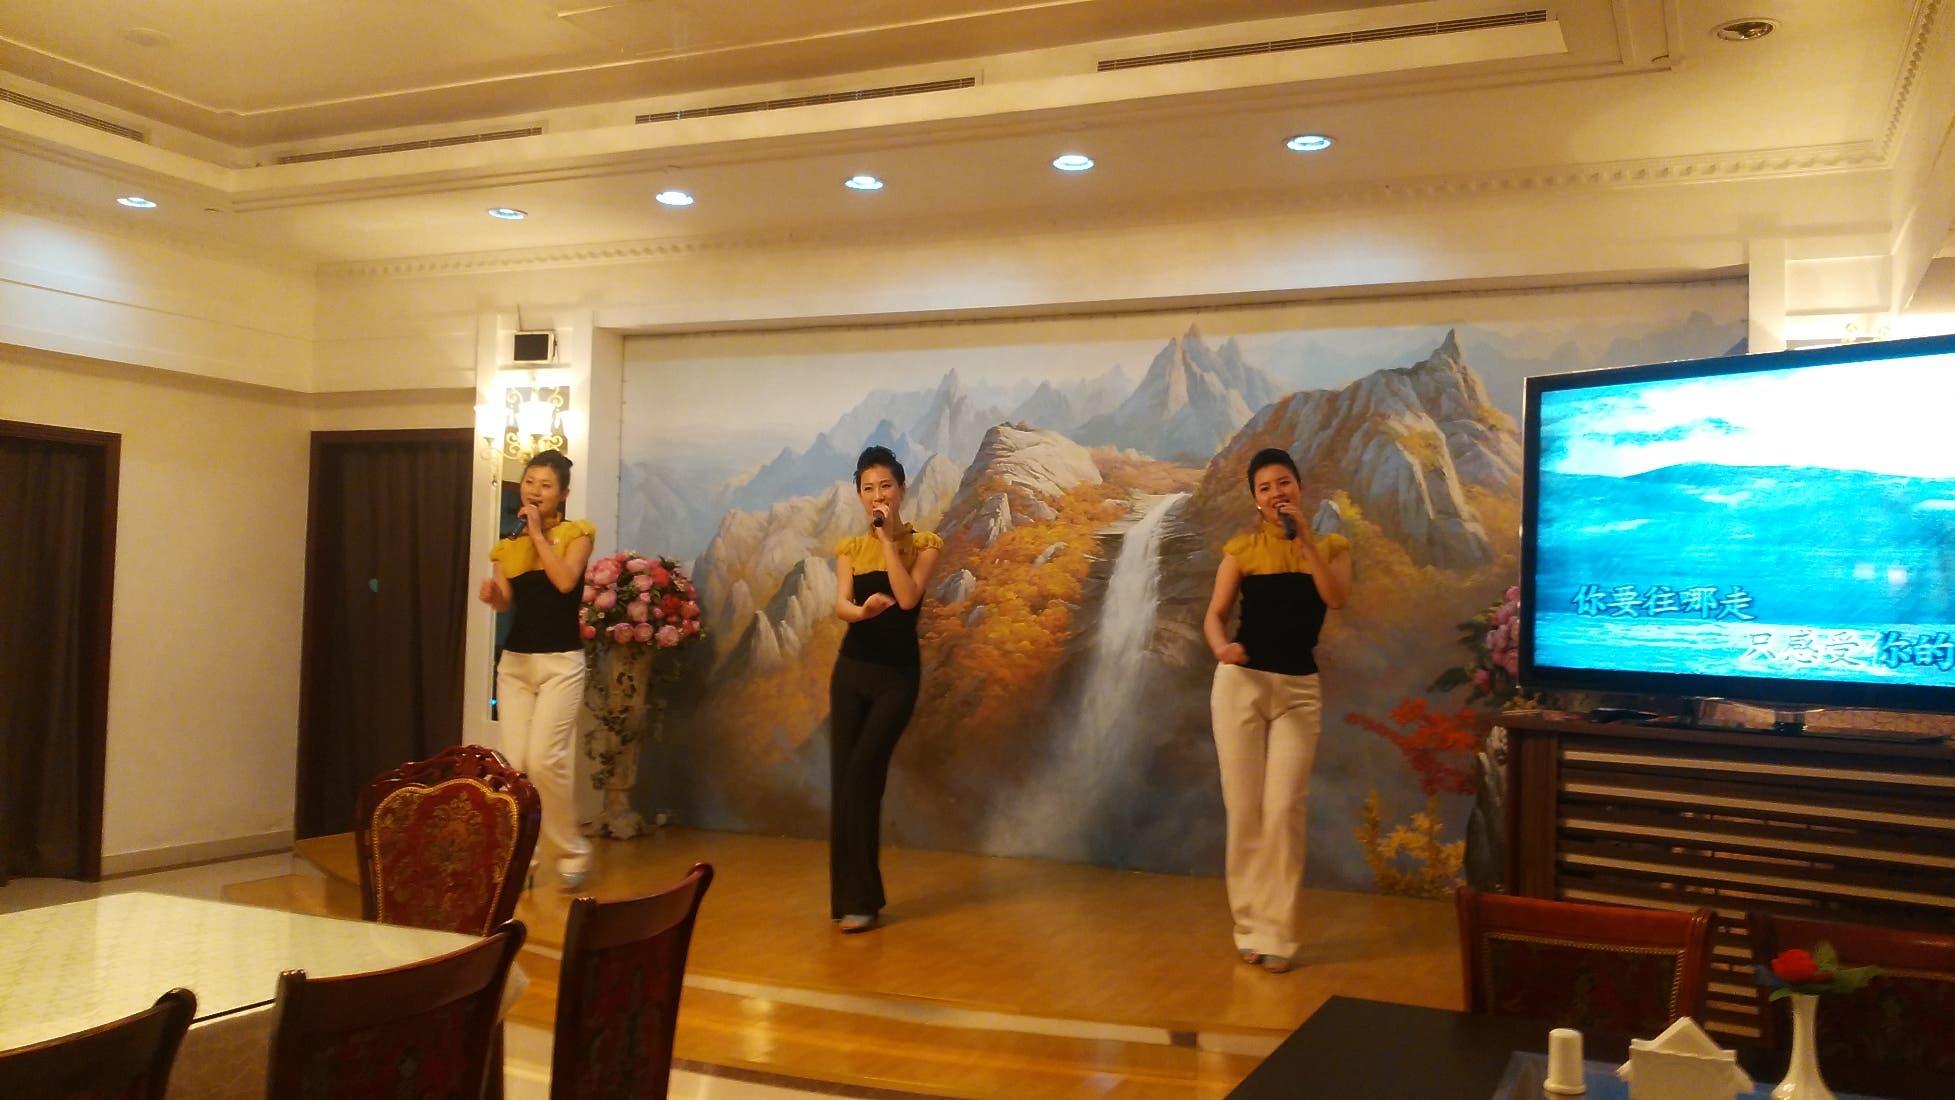 2- Dancers at the restaurant singing 'You are my superstar' with the aid of a karoke machine. All Okryu-gwan staff wear small North Korean flags pinned to their uniforms. (Al Arabiya)